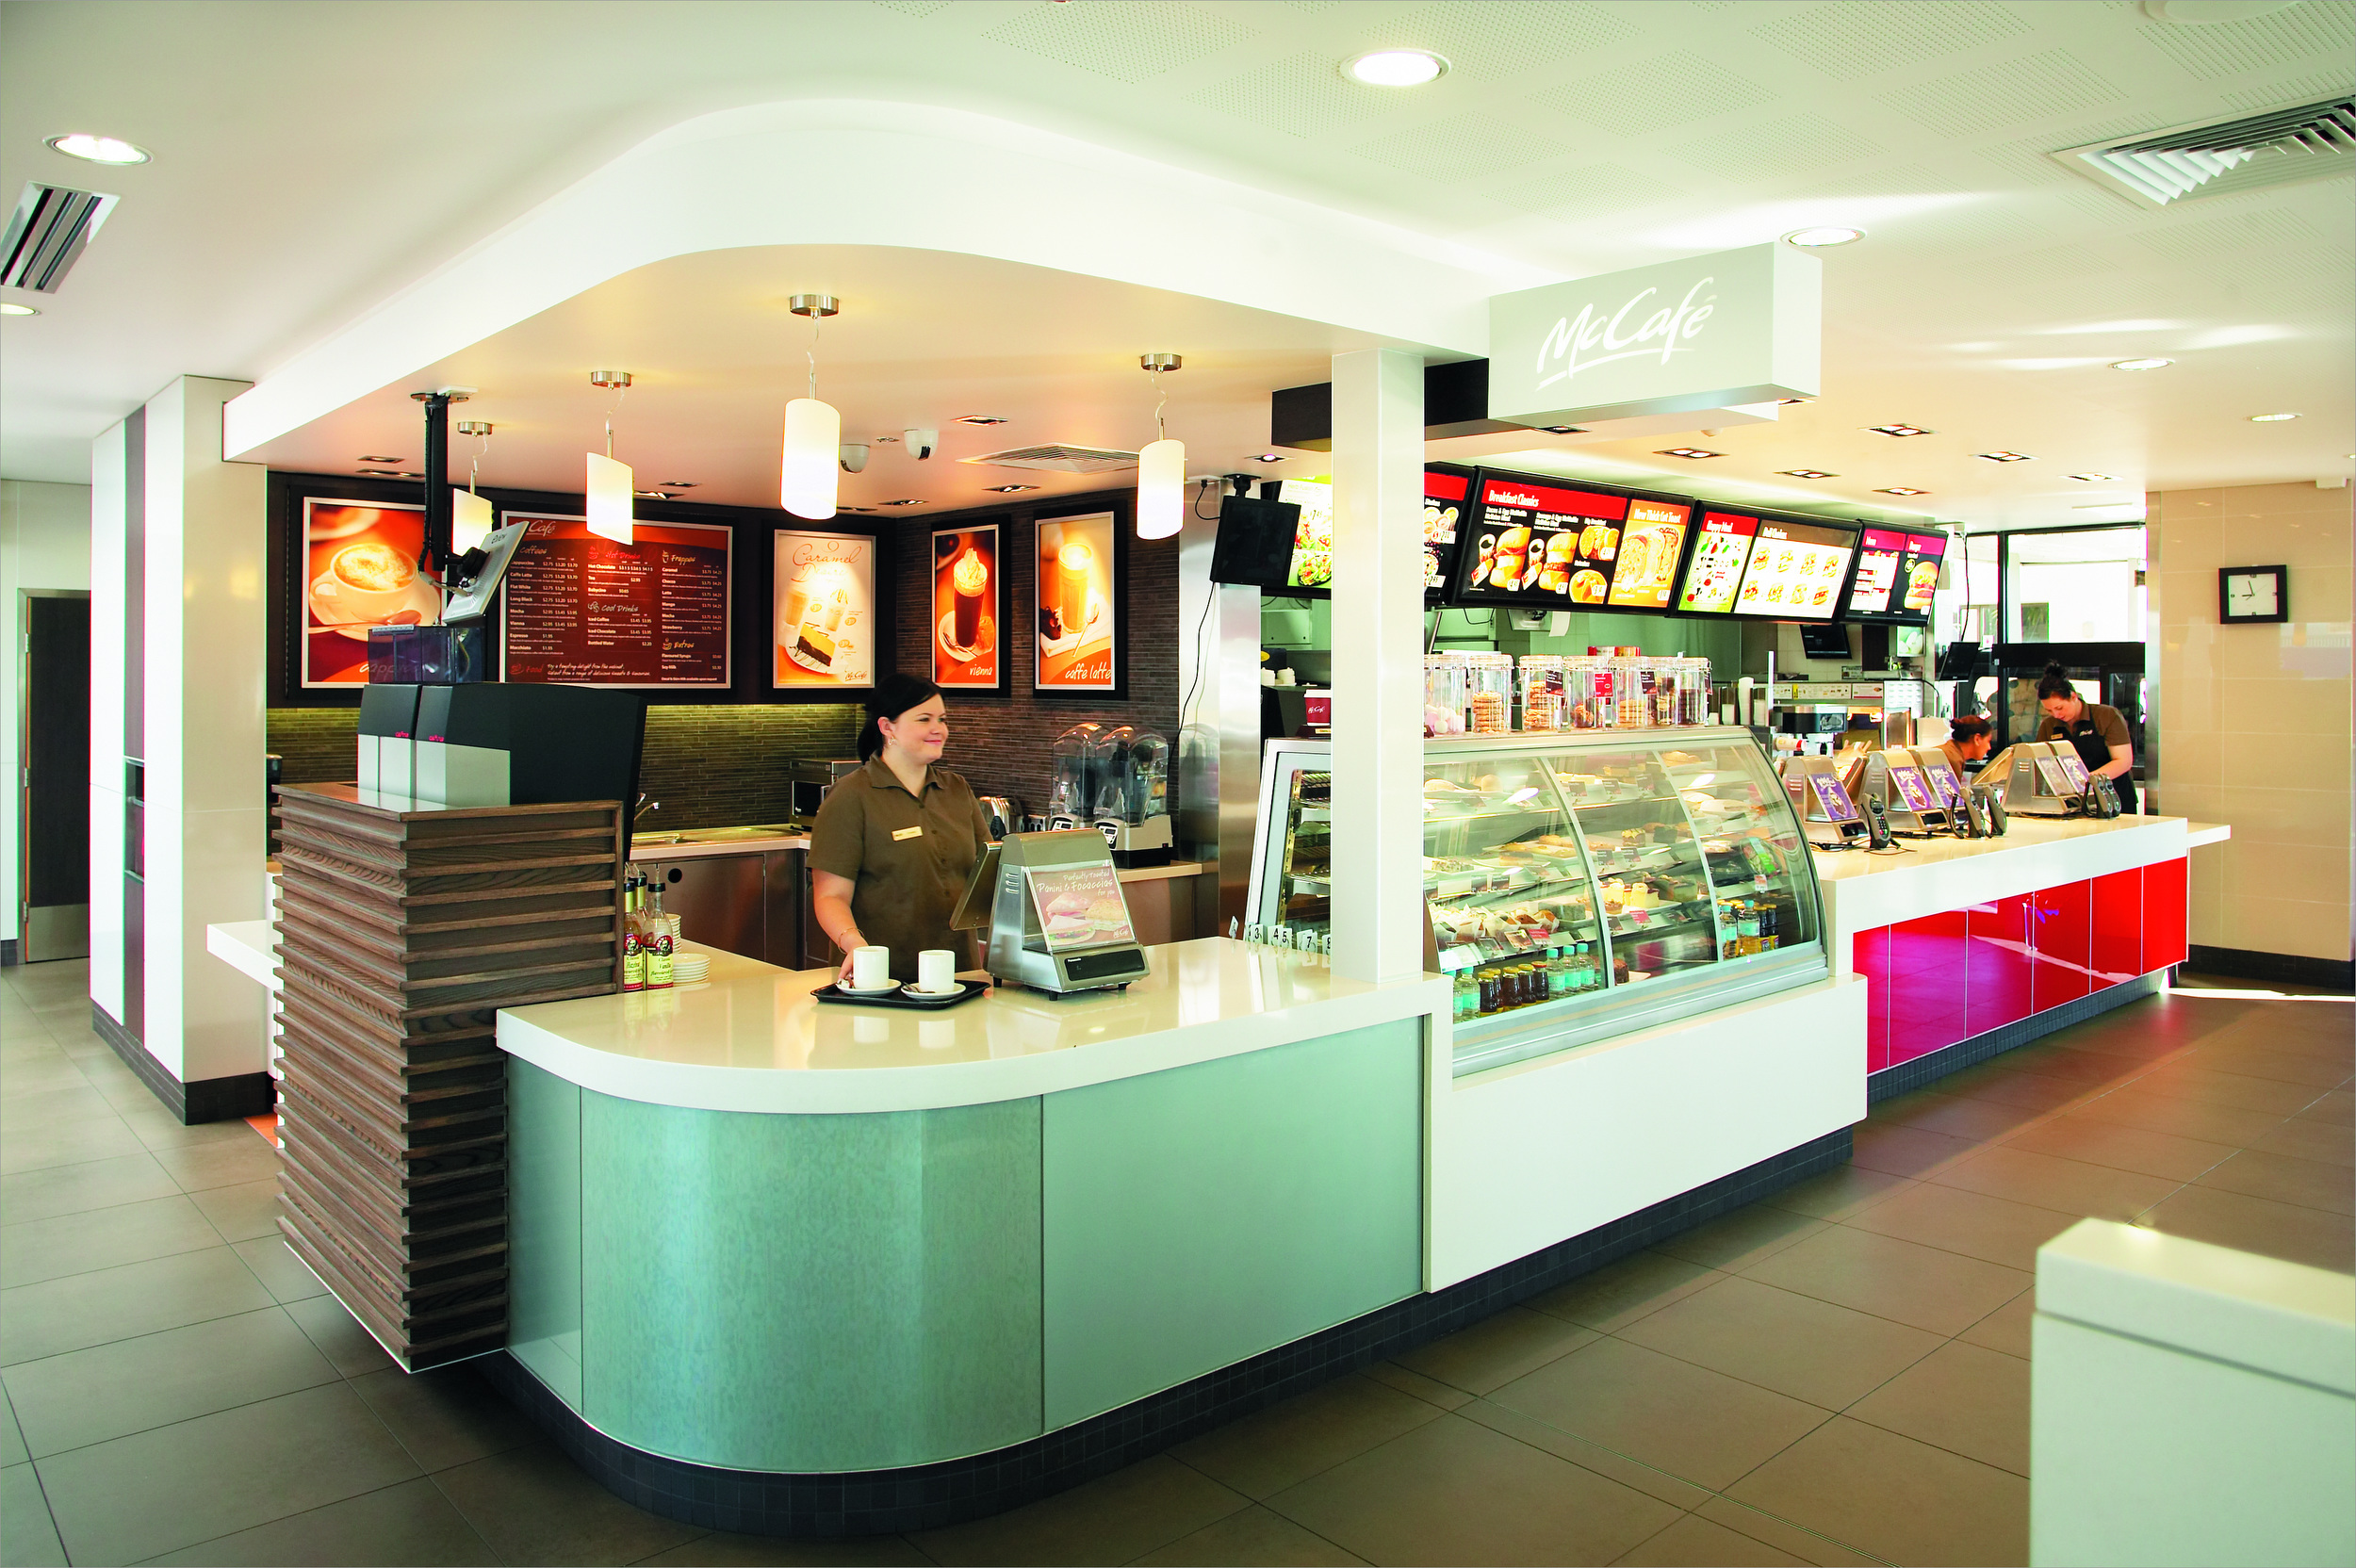 McDonalds Tuart Hill_122109_s.JPG